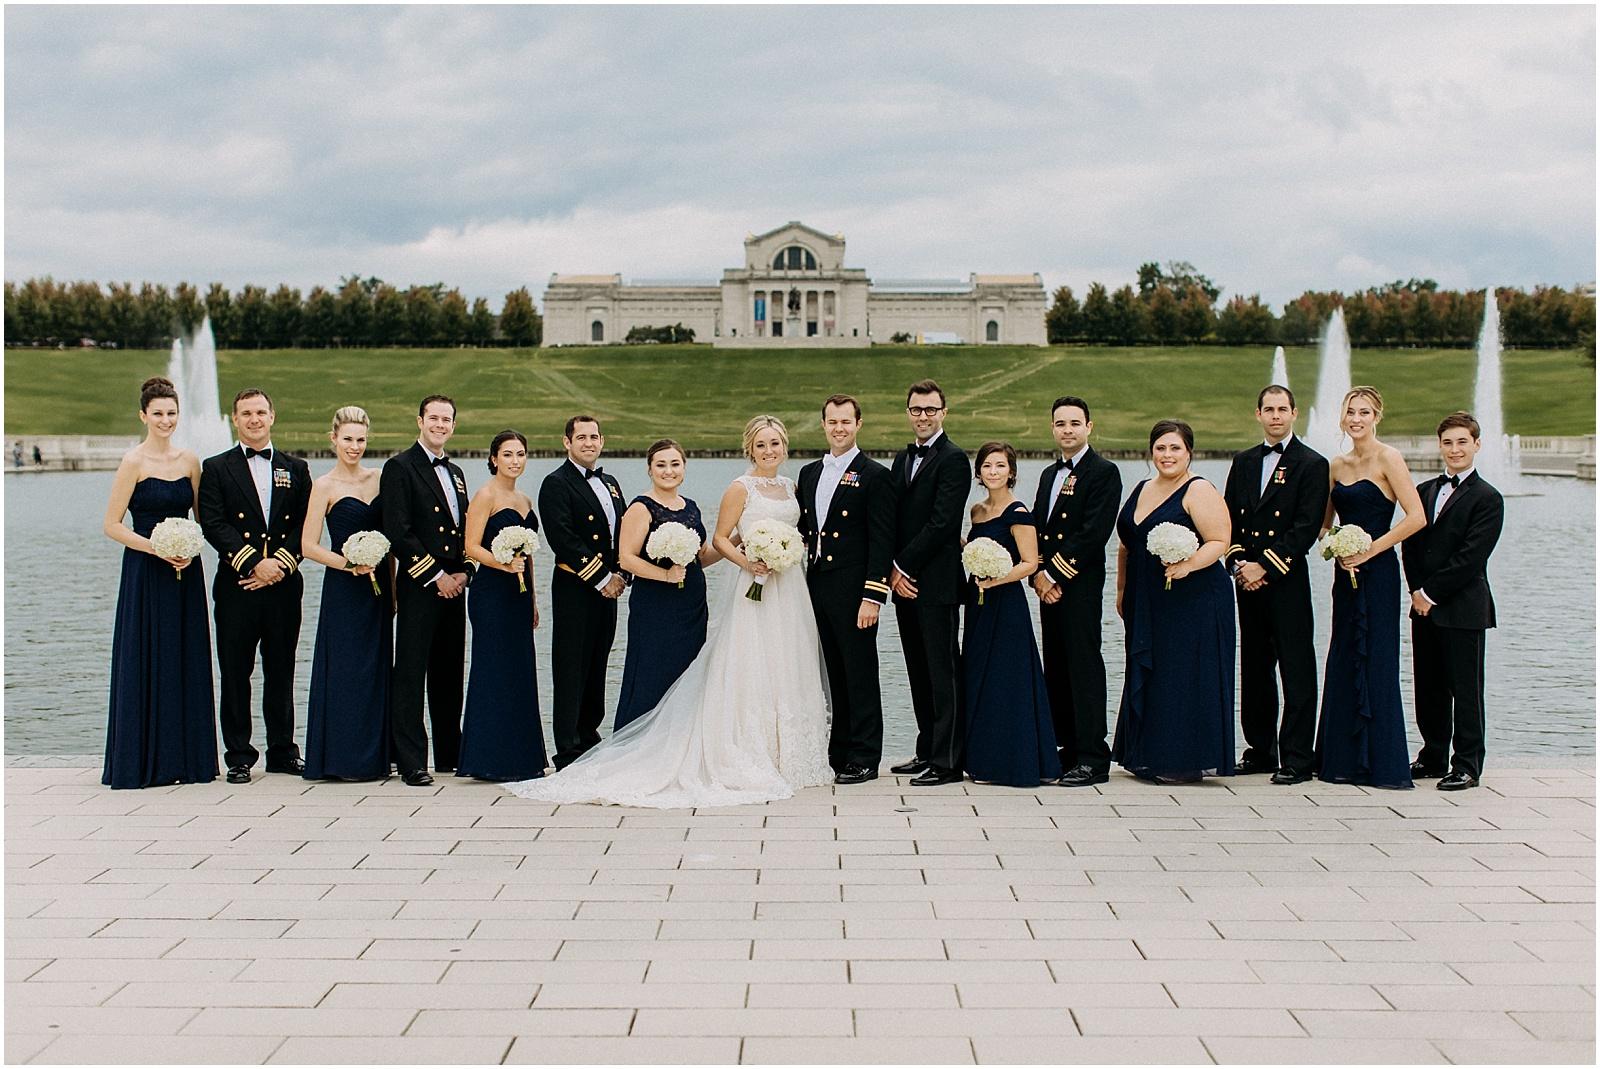 glen_echo_st_louis_mo_wedding_0065.jpg